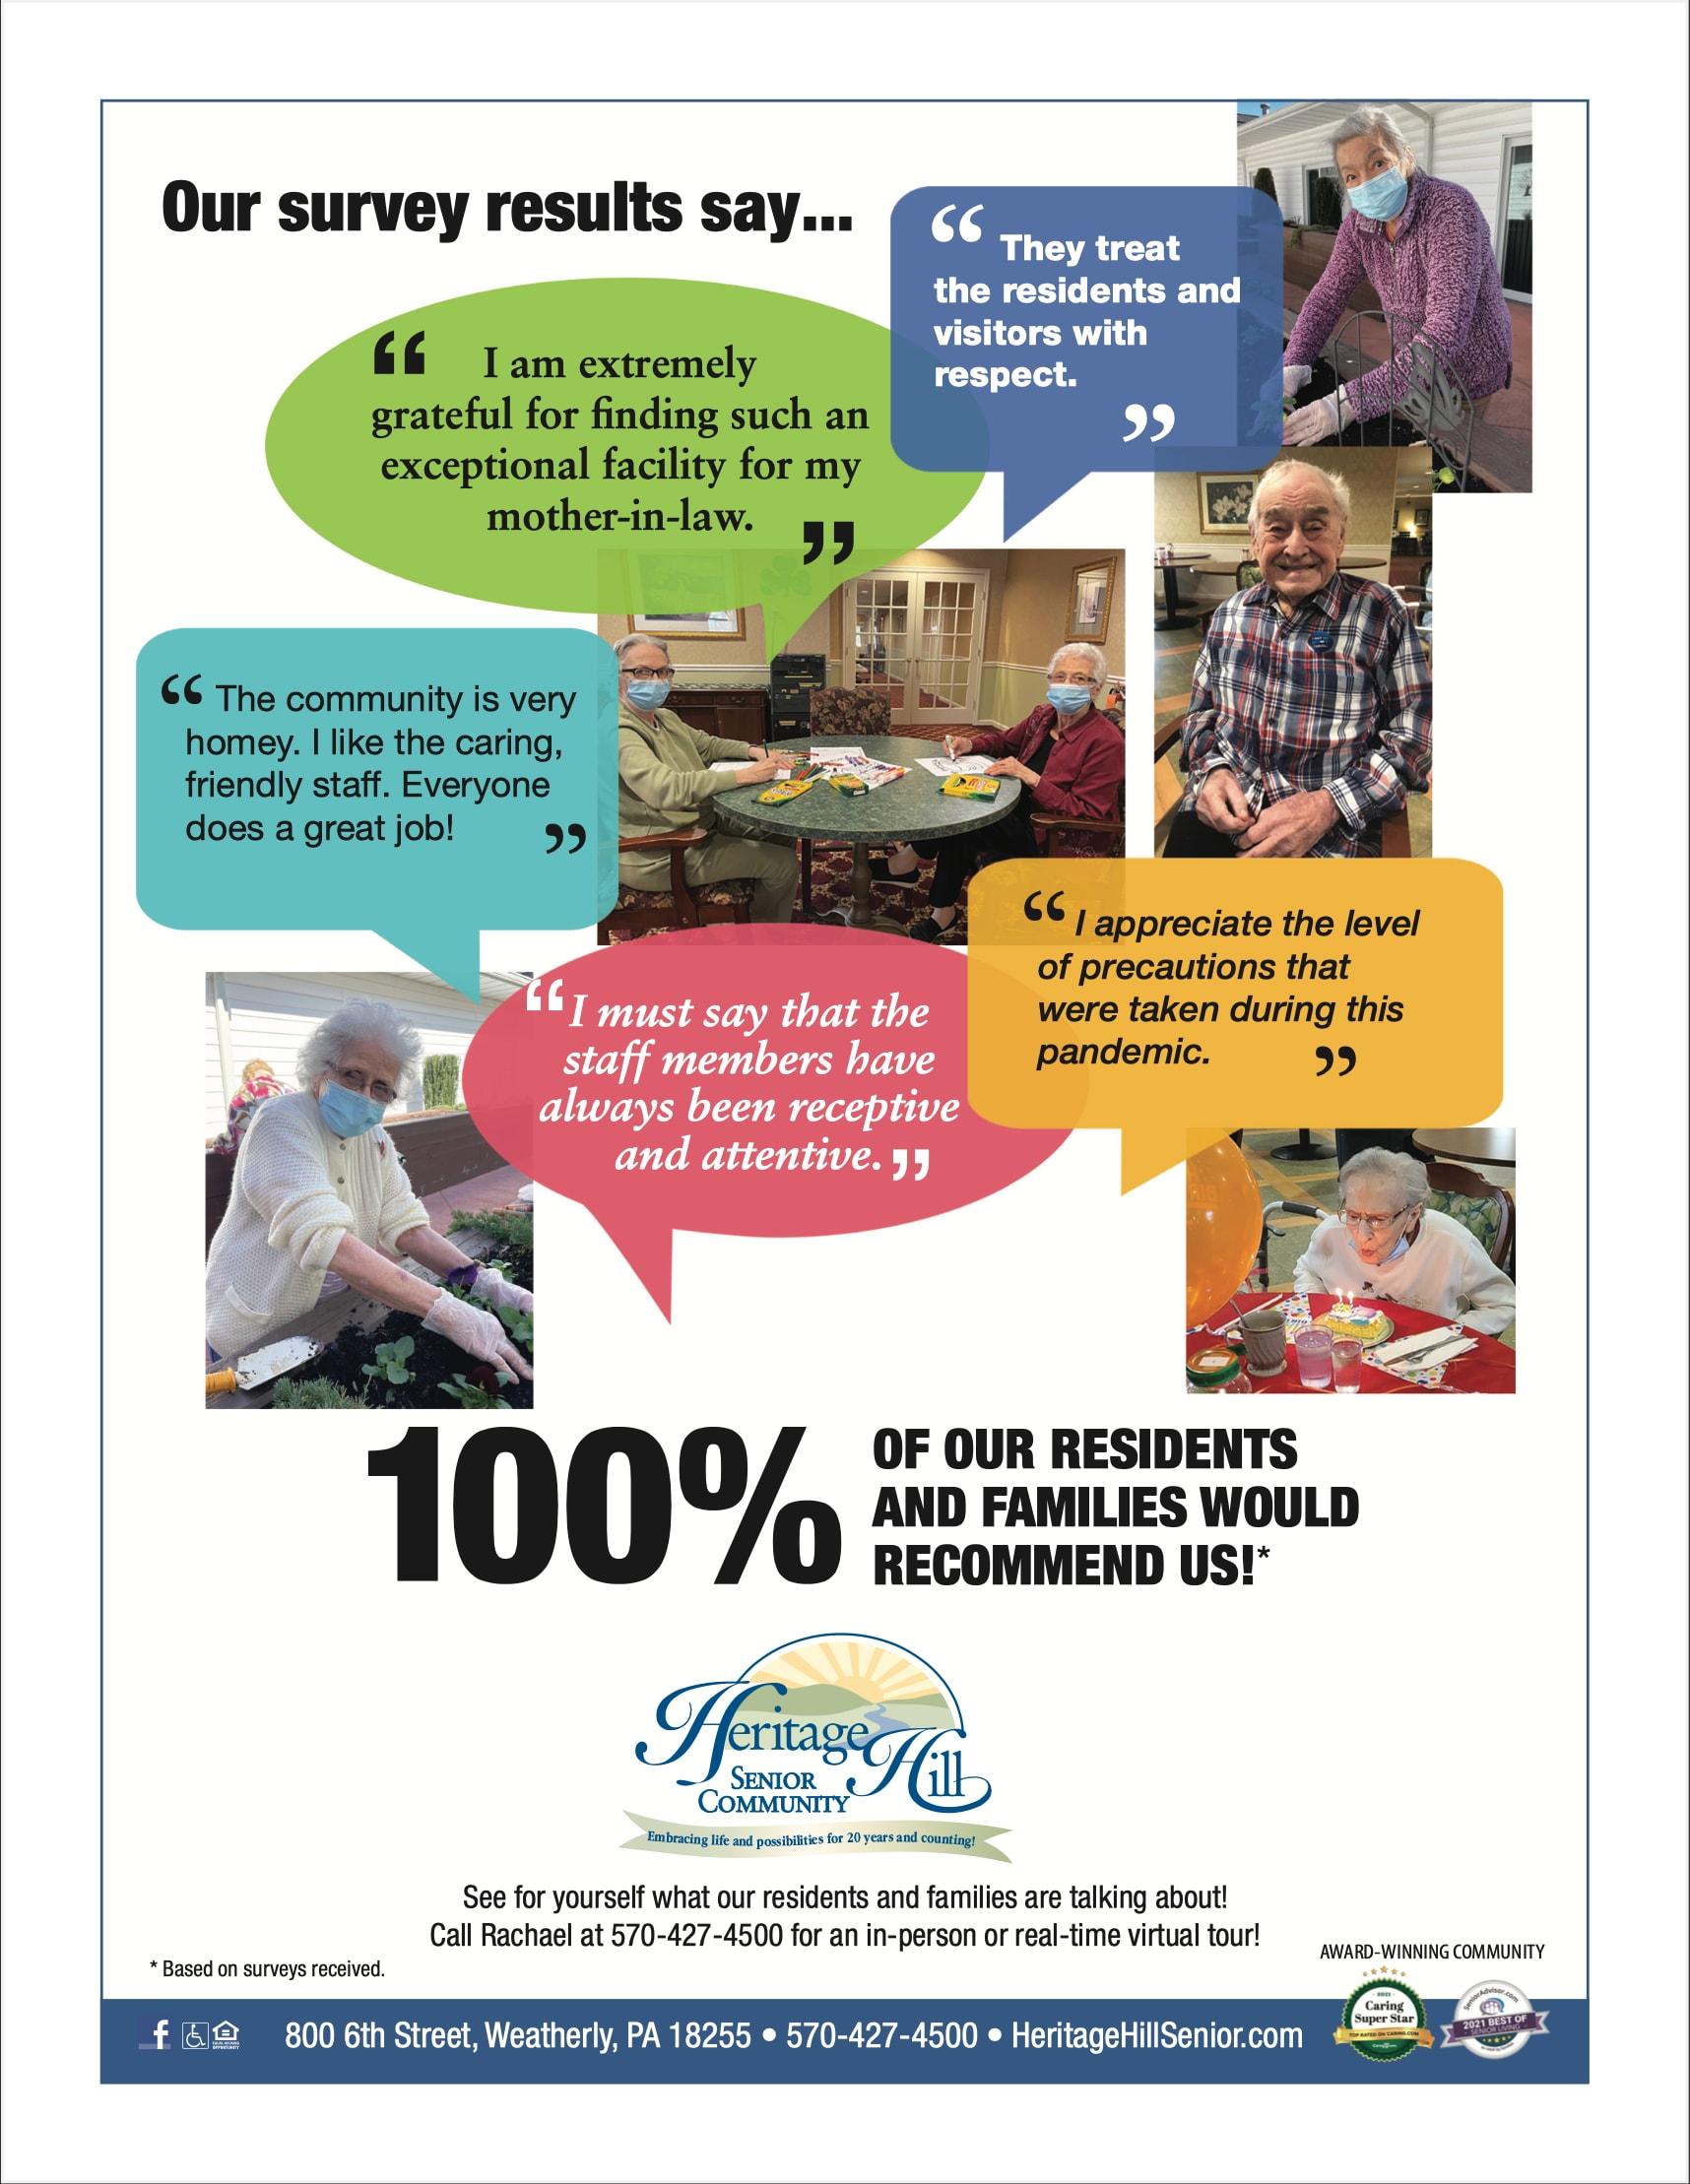 Survey Results at Heritage Hill Senior Community